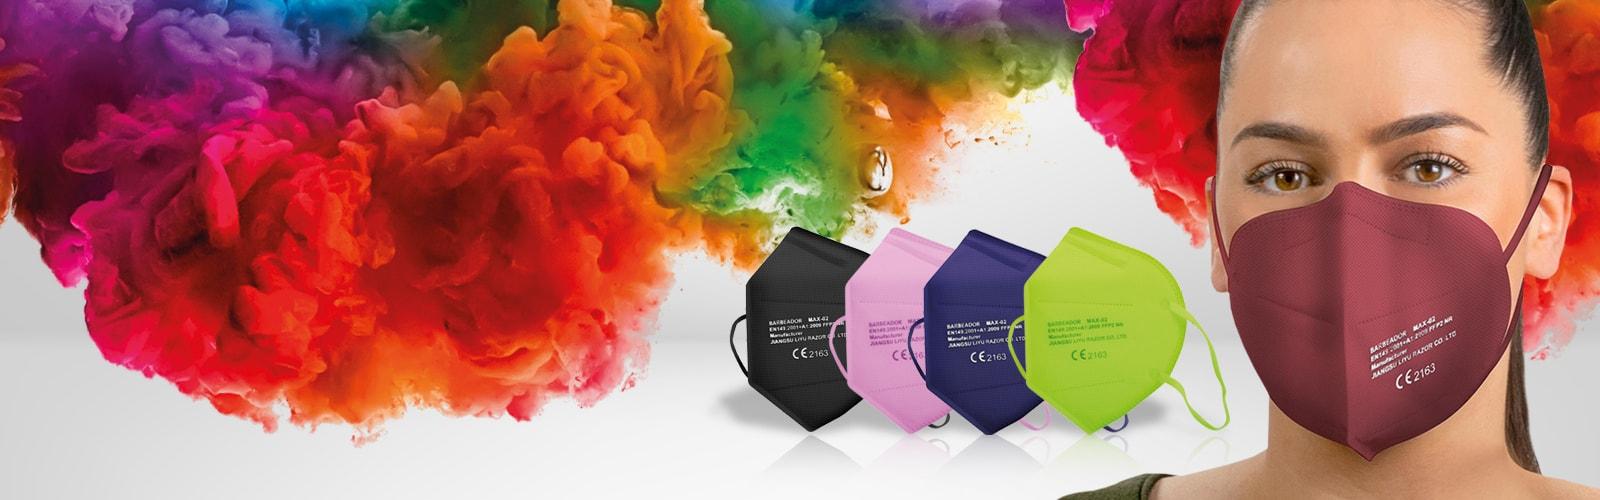 Gekleurde FFP2-maskers